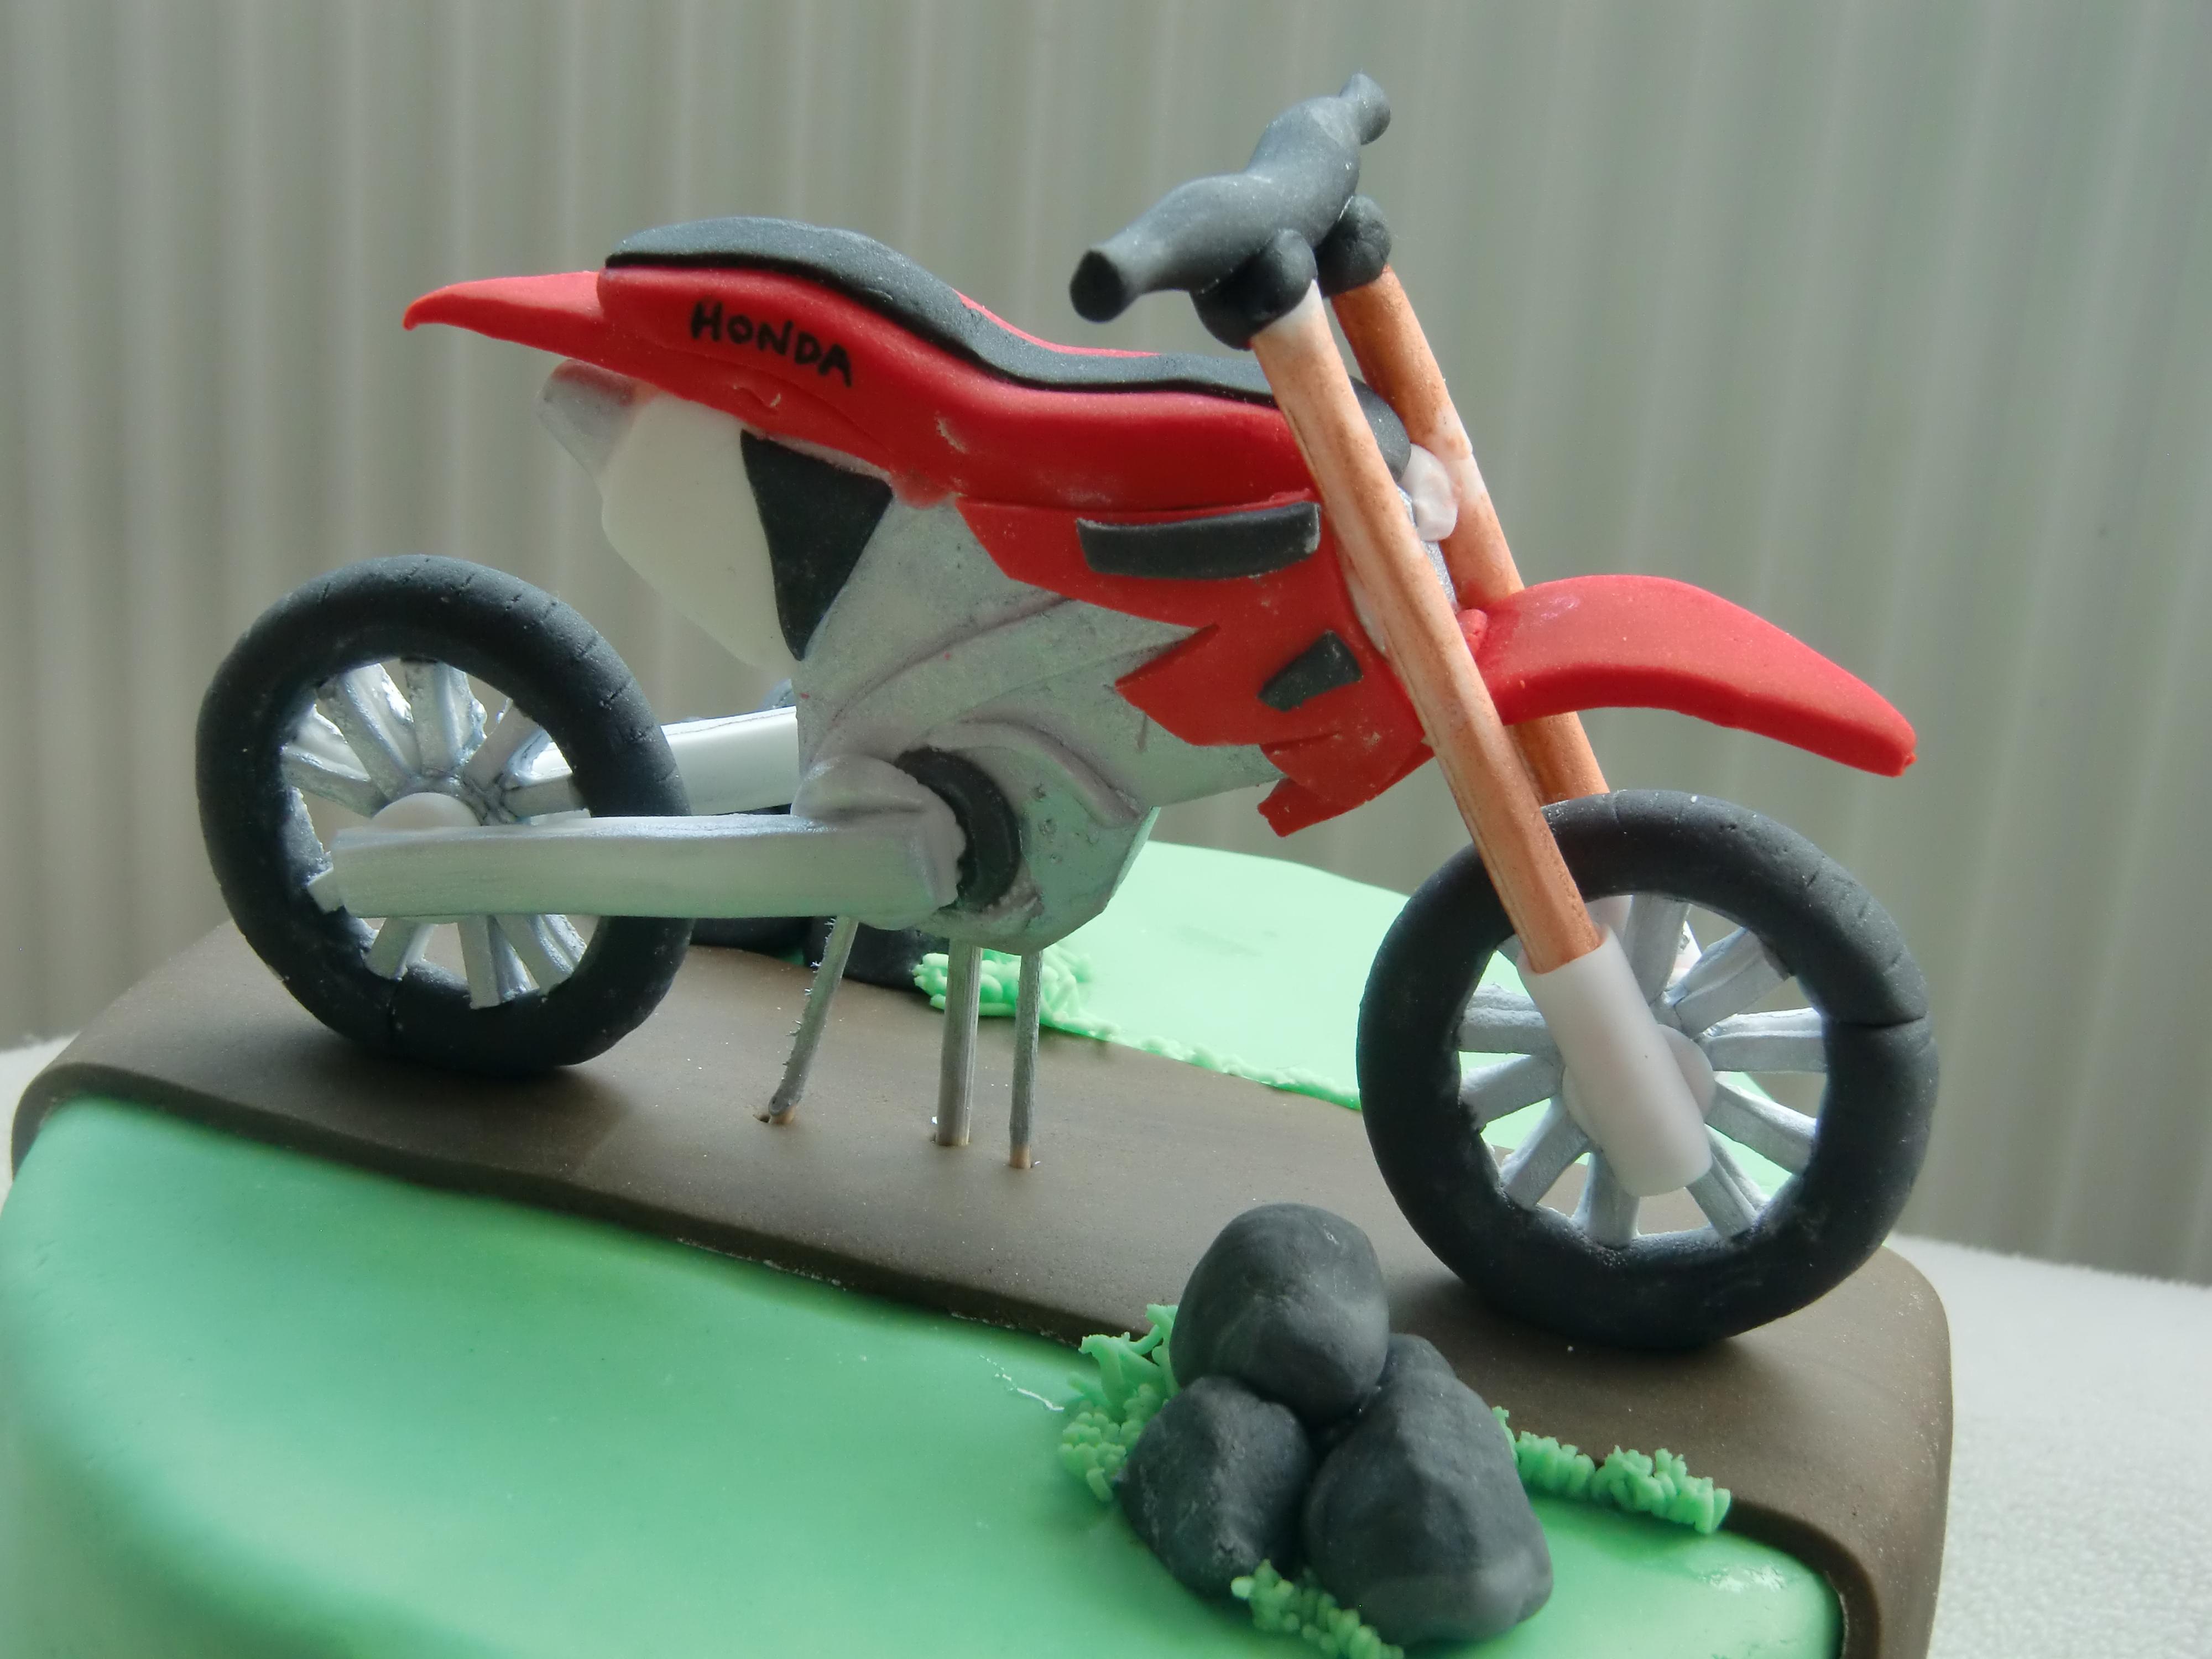 Honda Bike Motor Cross Bike Cake Mixture Of Modelling